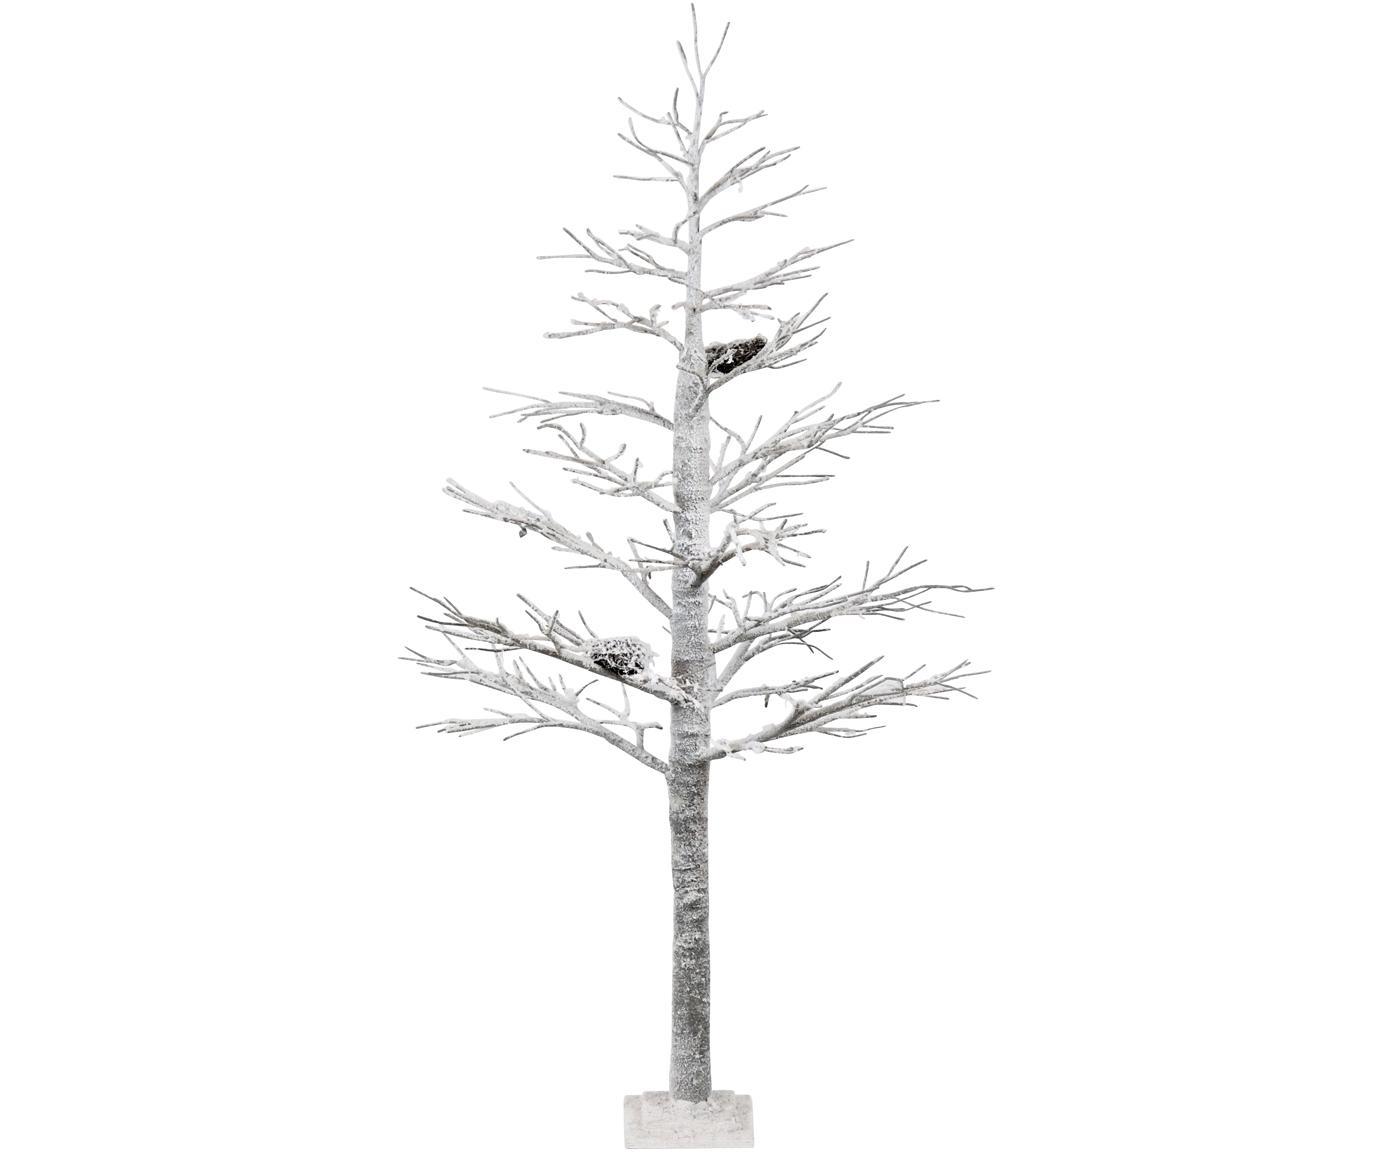 Deko-Objekt Ornament, Holz, bemalt, Weiß, Ø 70 x H 150 cm